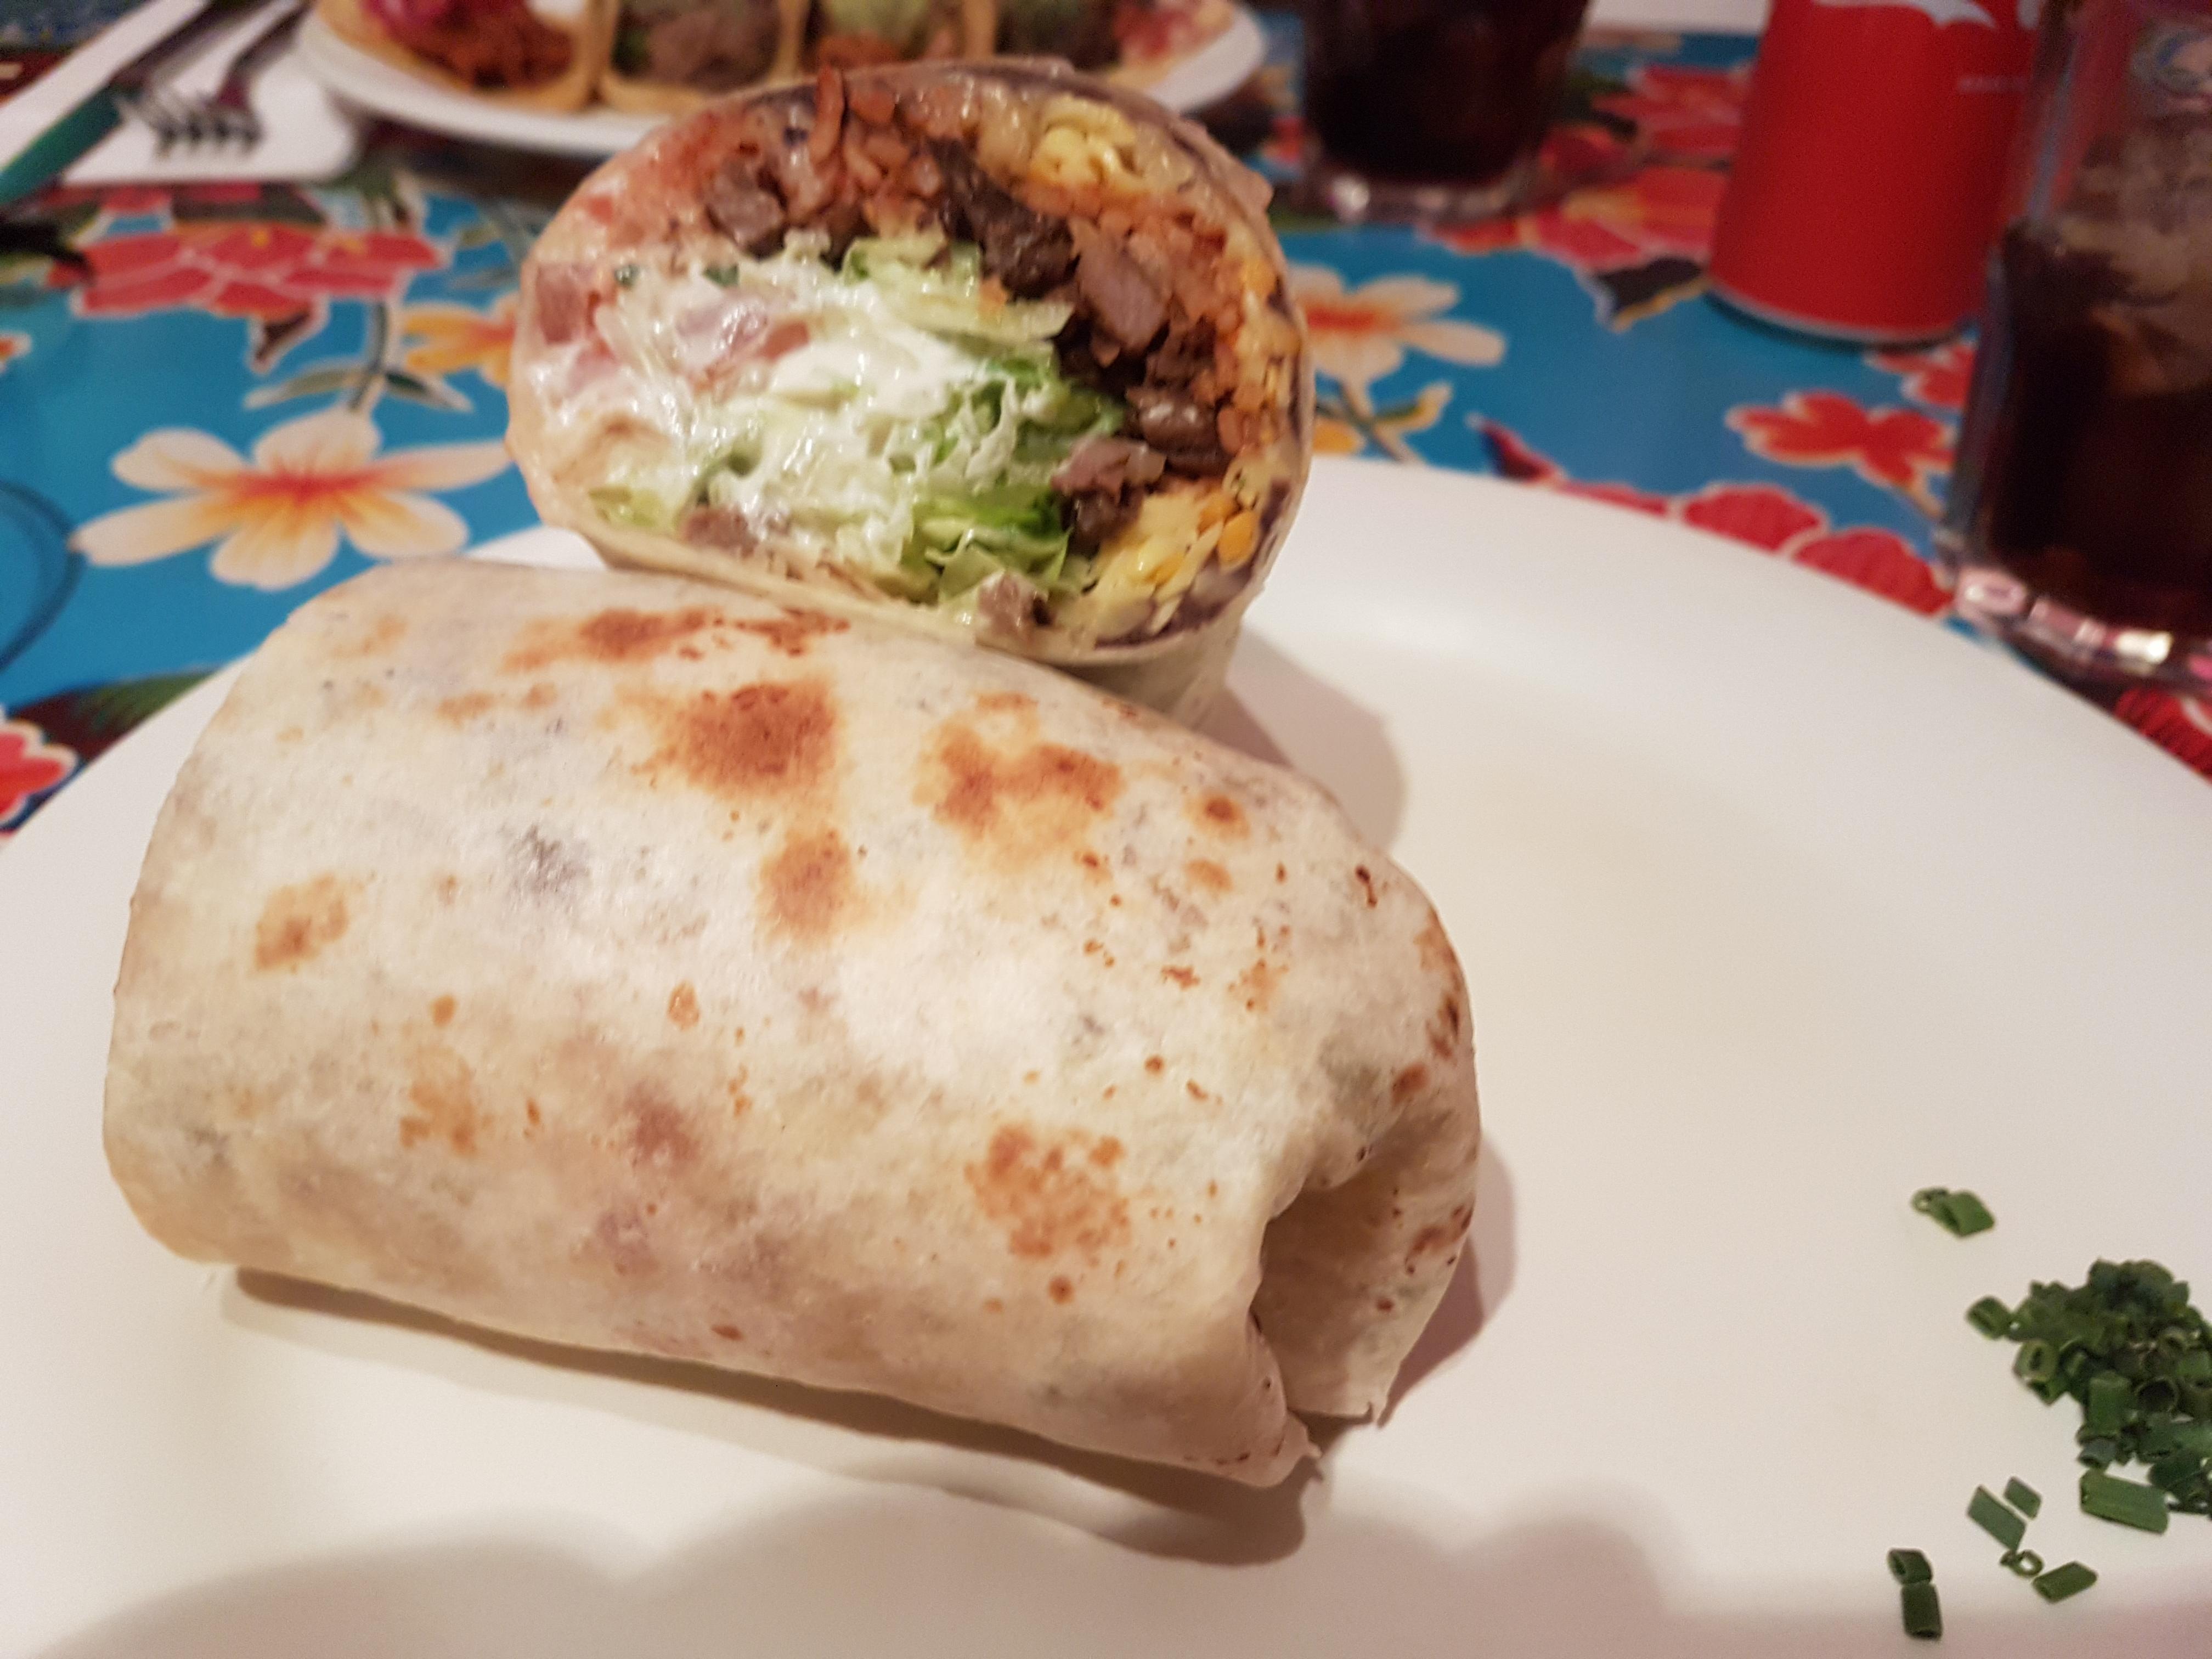 http://foodloader.net/Holz_2018-10-23_Burrito.jpg